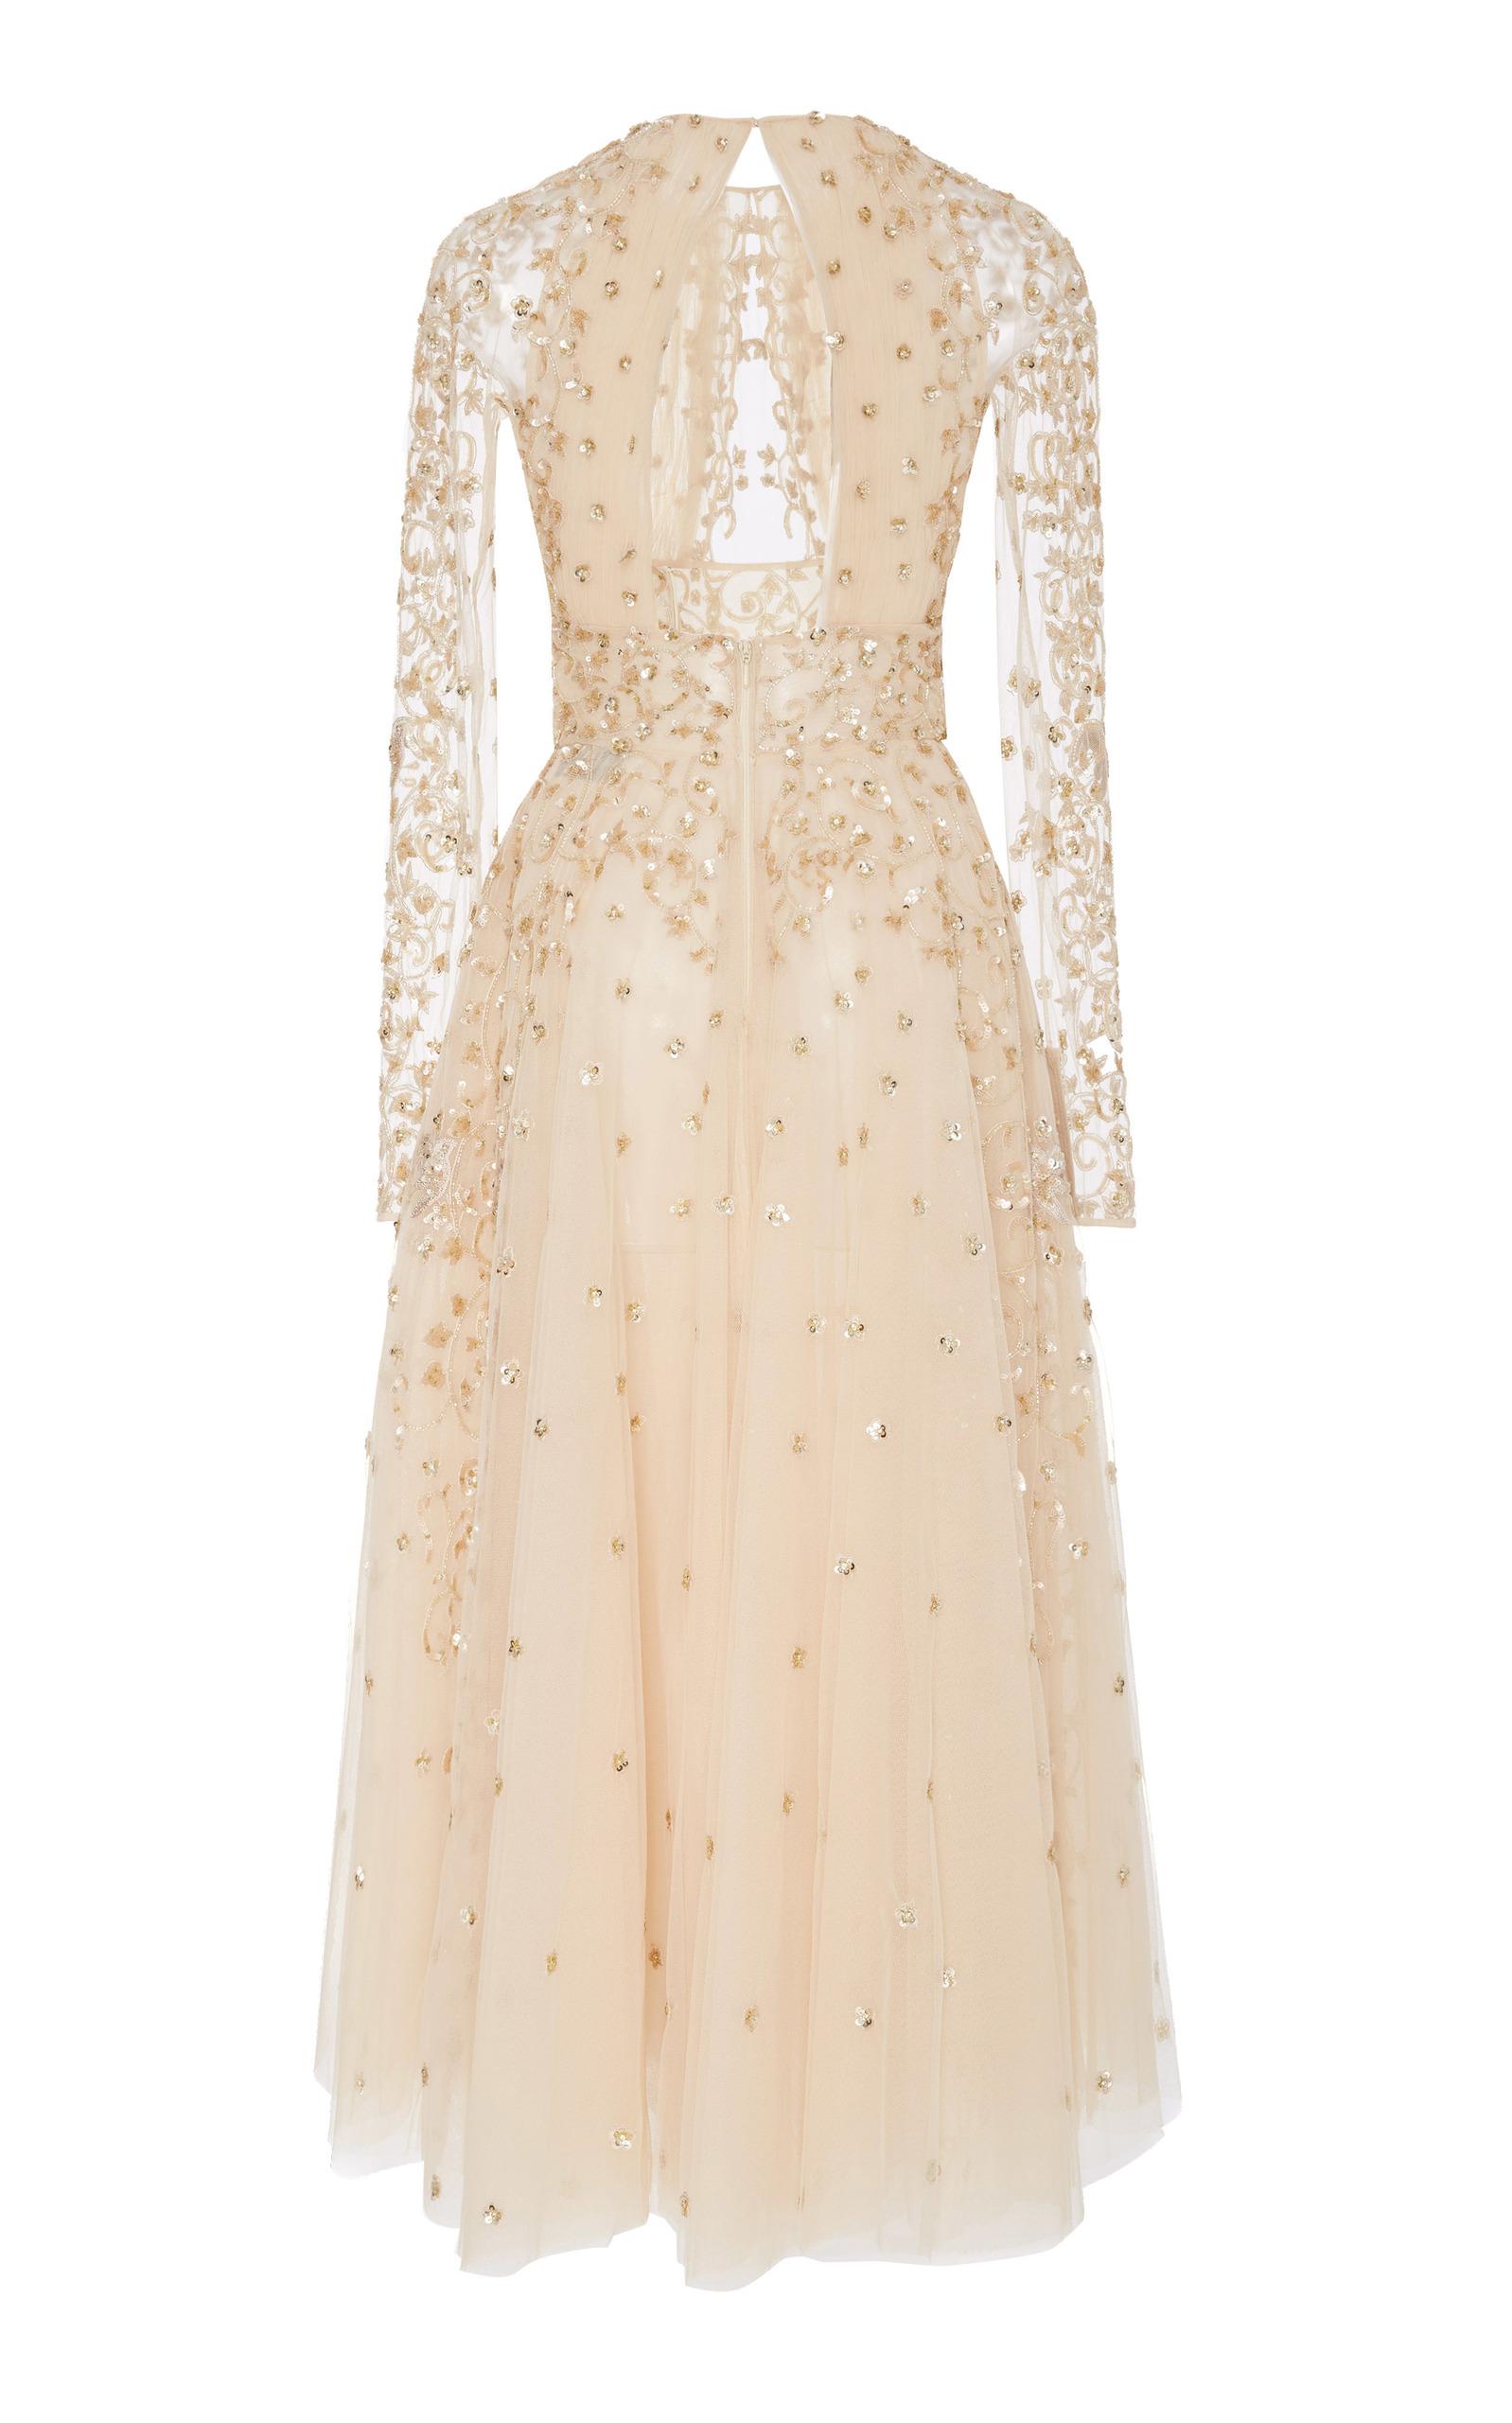 ea819e172b09 Zuhair MuradArianna Embellished Silk Midi Dress. CLOSE. Loading. Loading